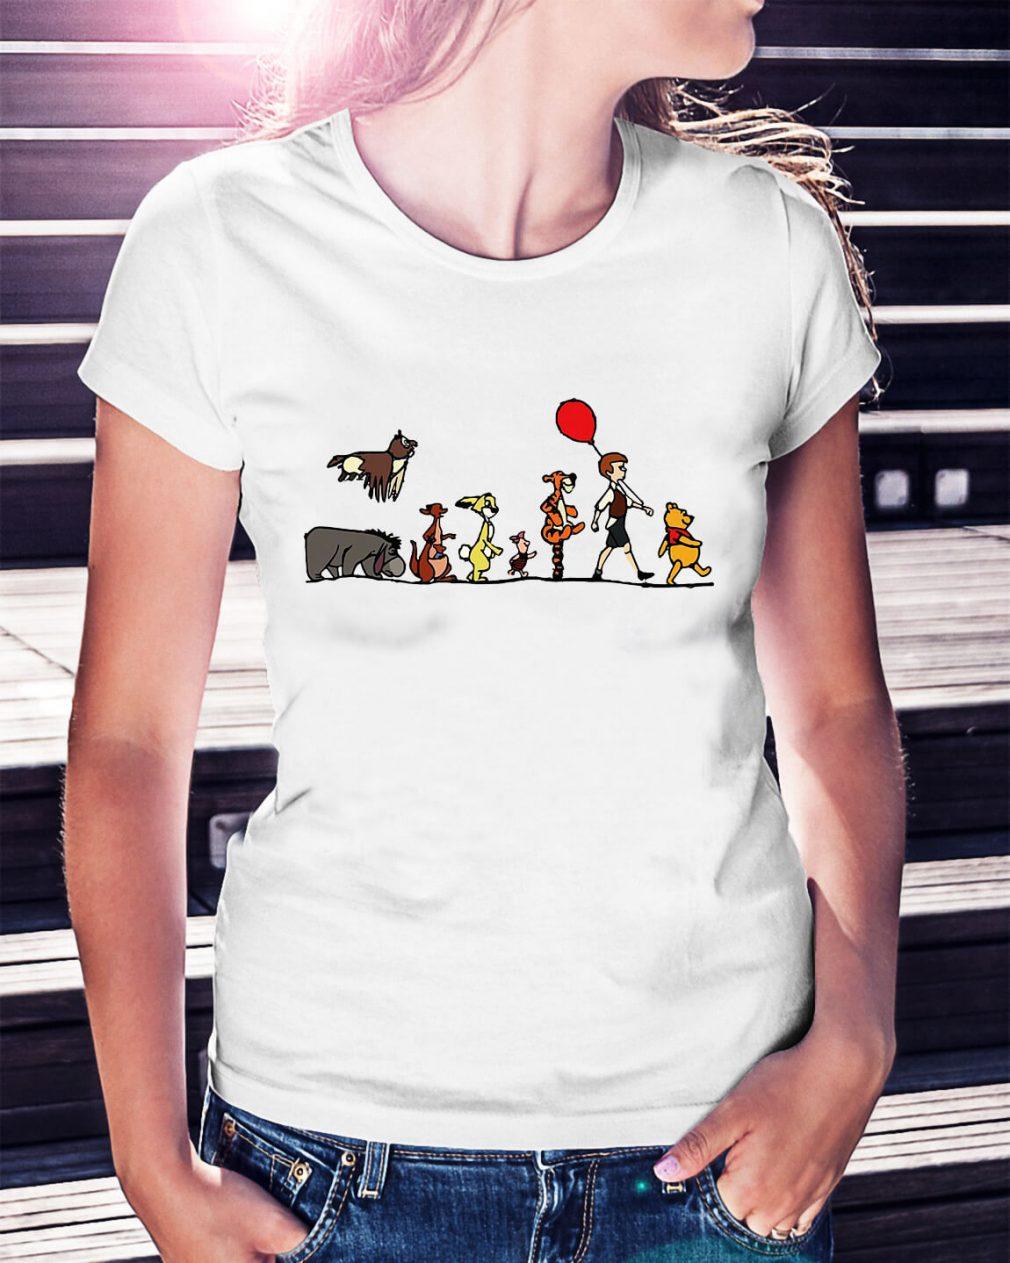 Disney Winnie the Pooh hundred acre wood shirt